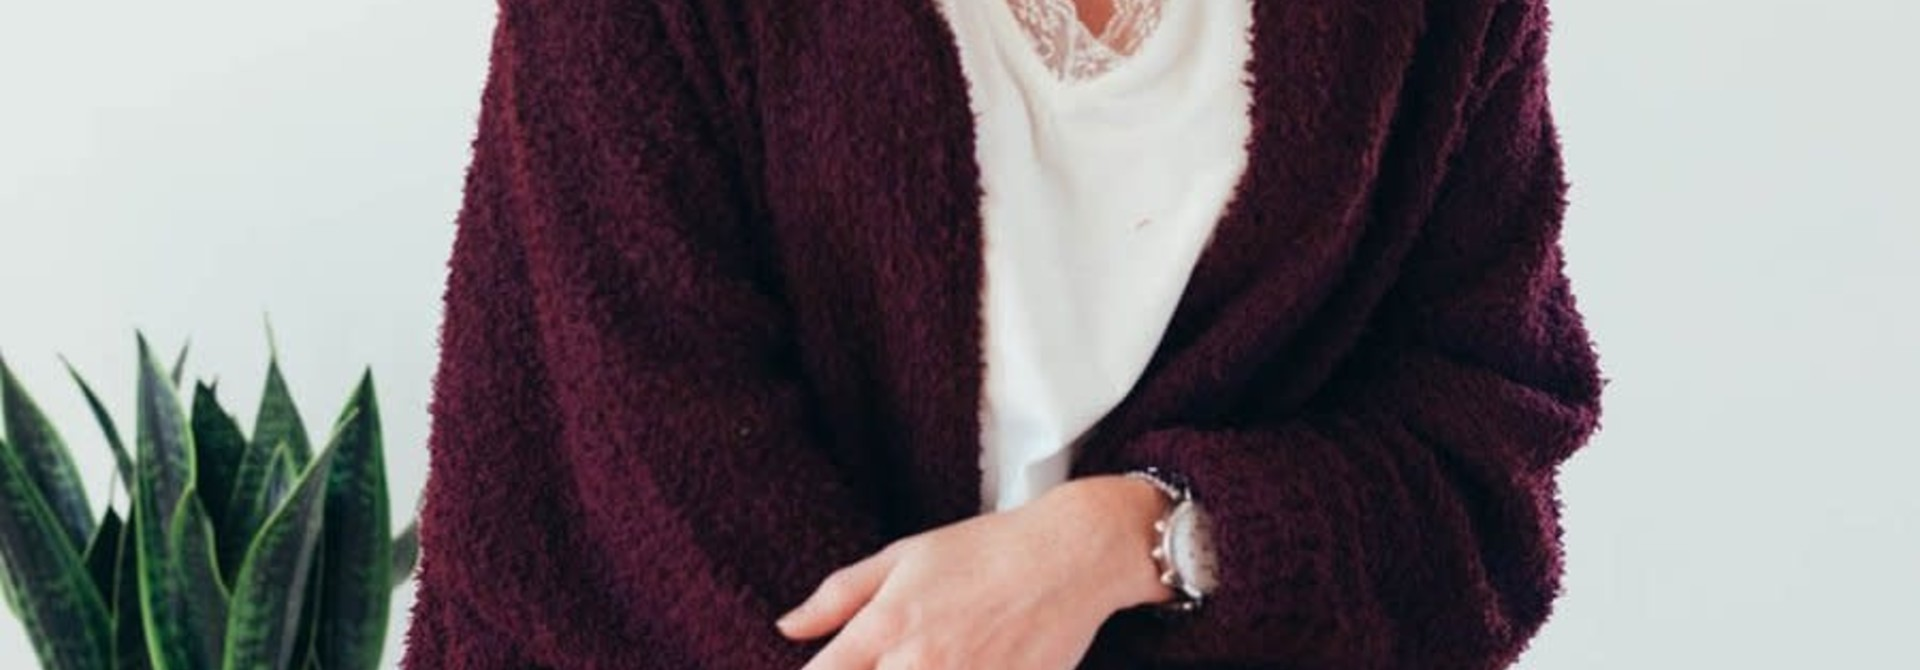 Warming Up Burgundy Popcorn Sweater Cardigan